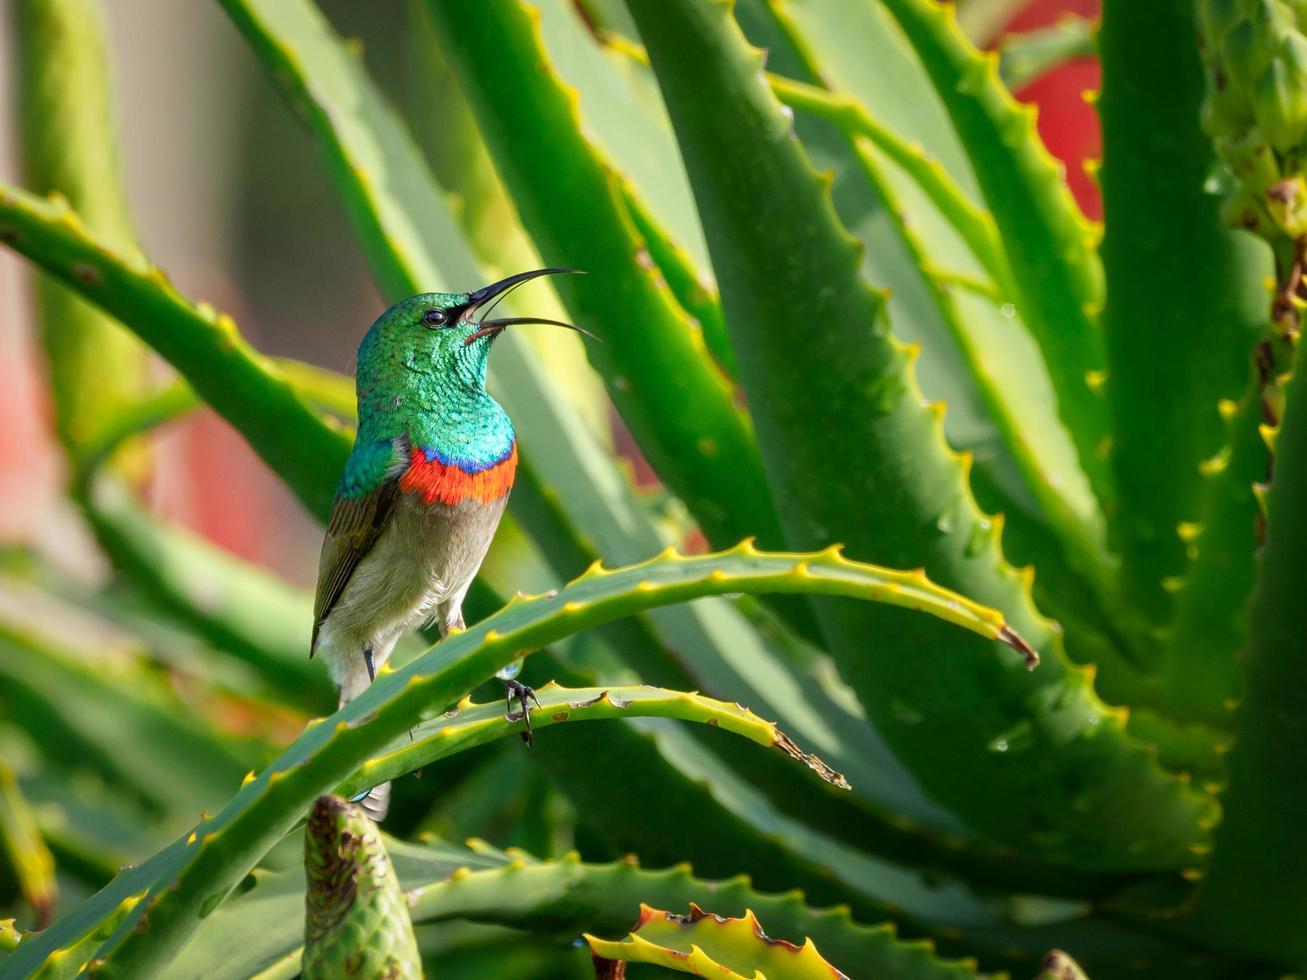 Southern double-collared sunbird on aloe vera plant photo